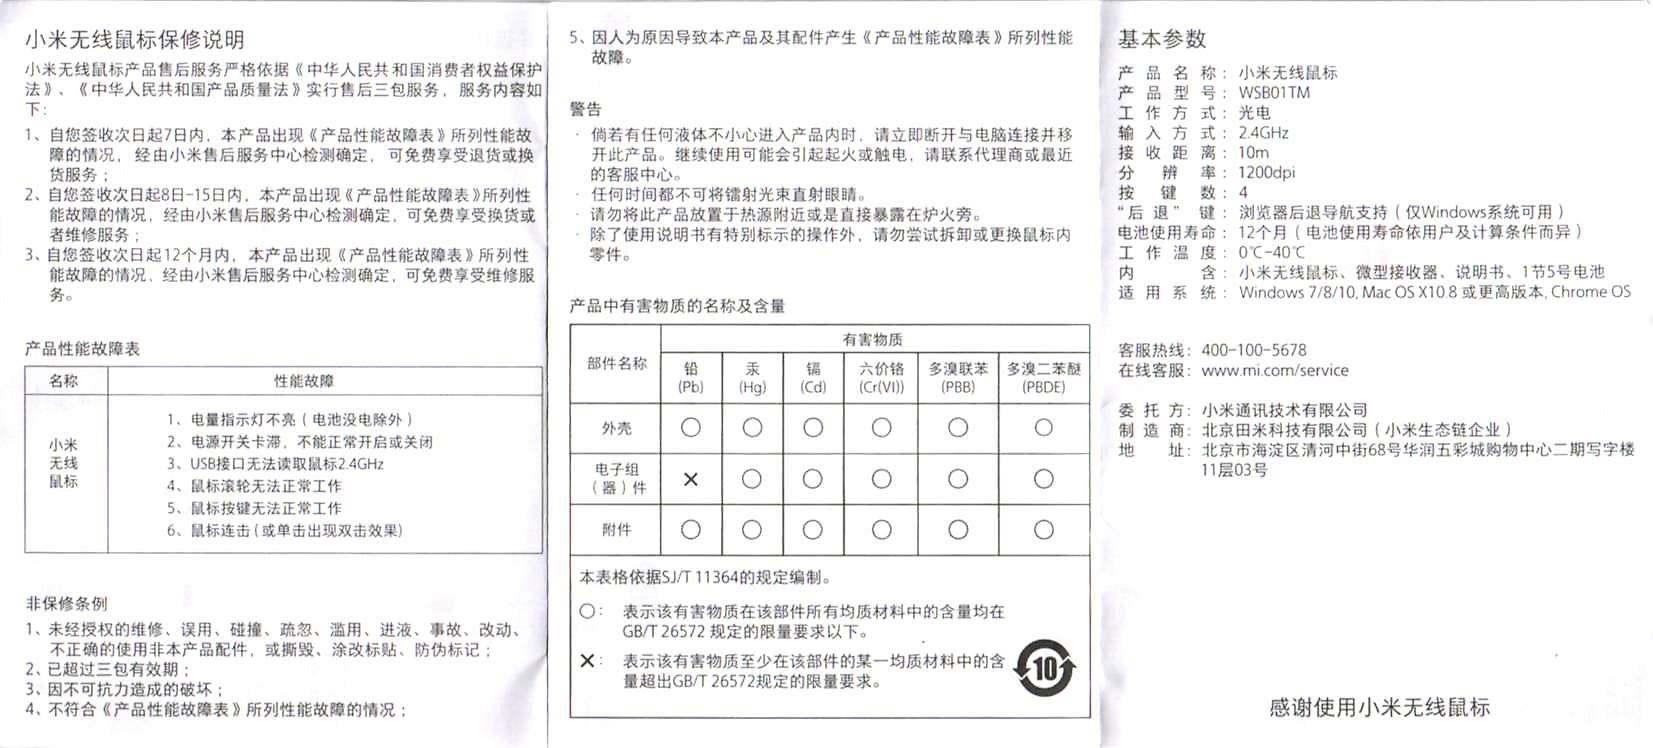 XIAOMI-1200DPI-2_4GHz-4-Buttons-Wireless-Optical-Mouse2